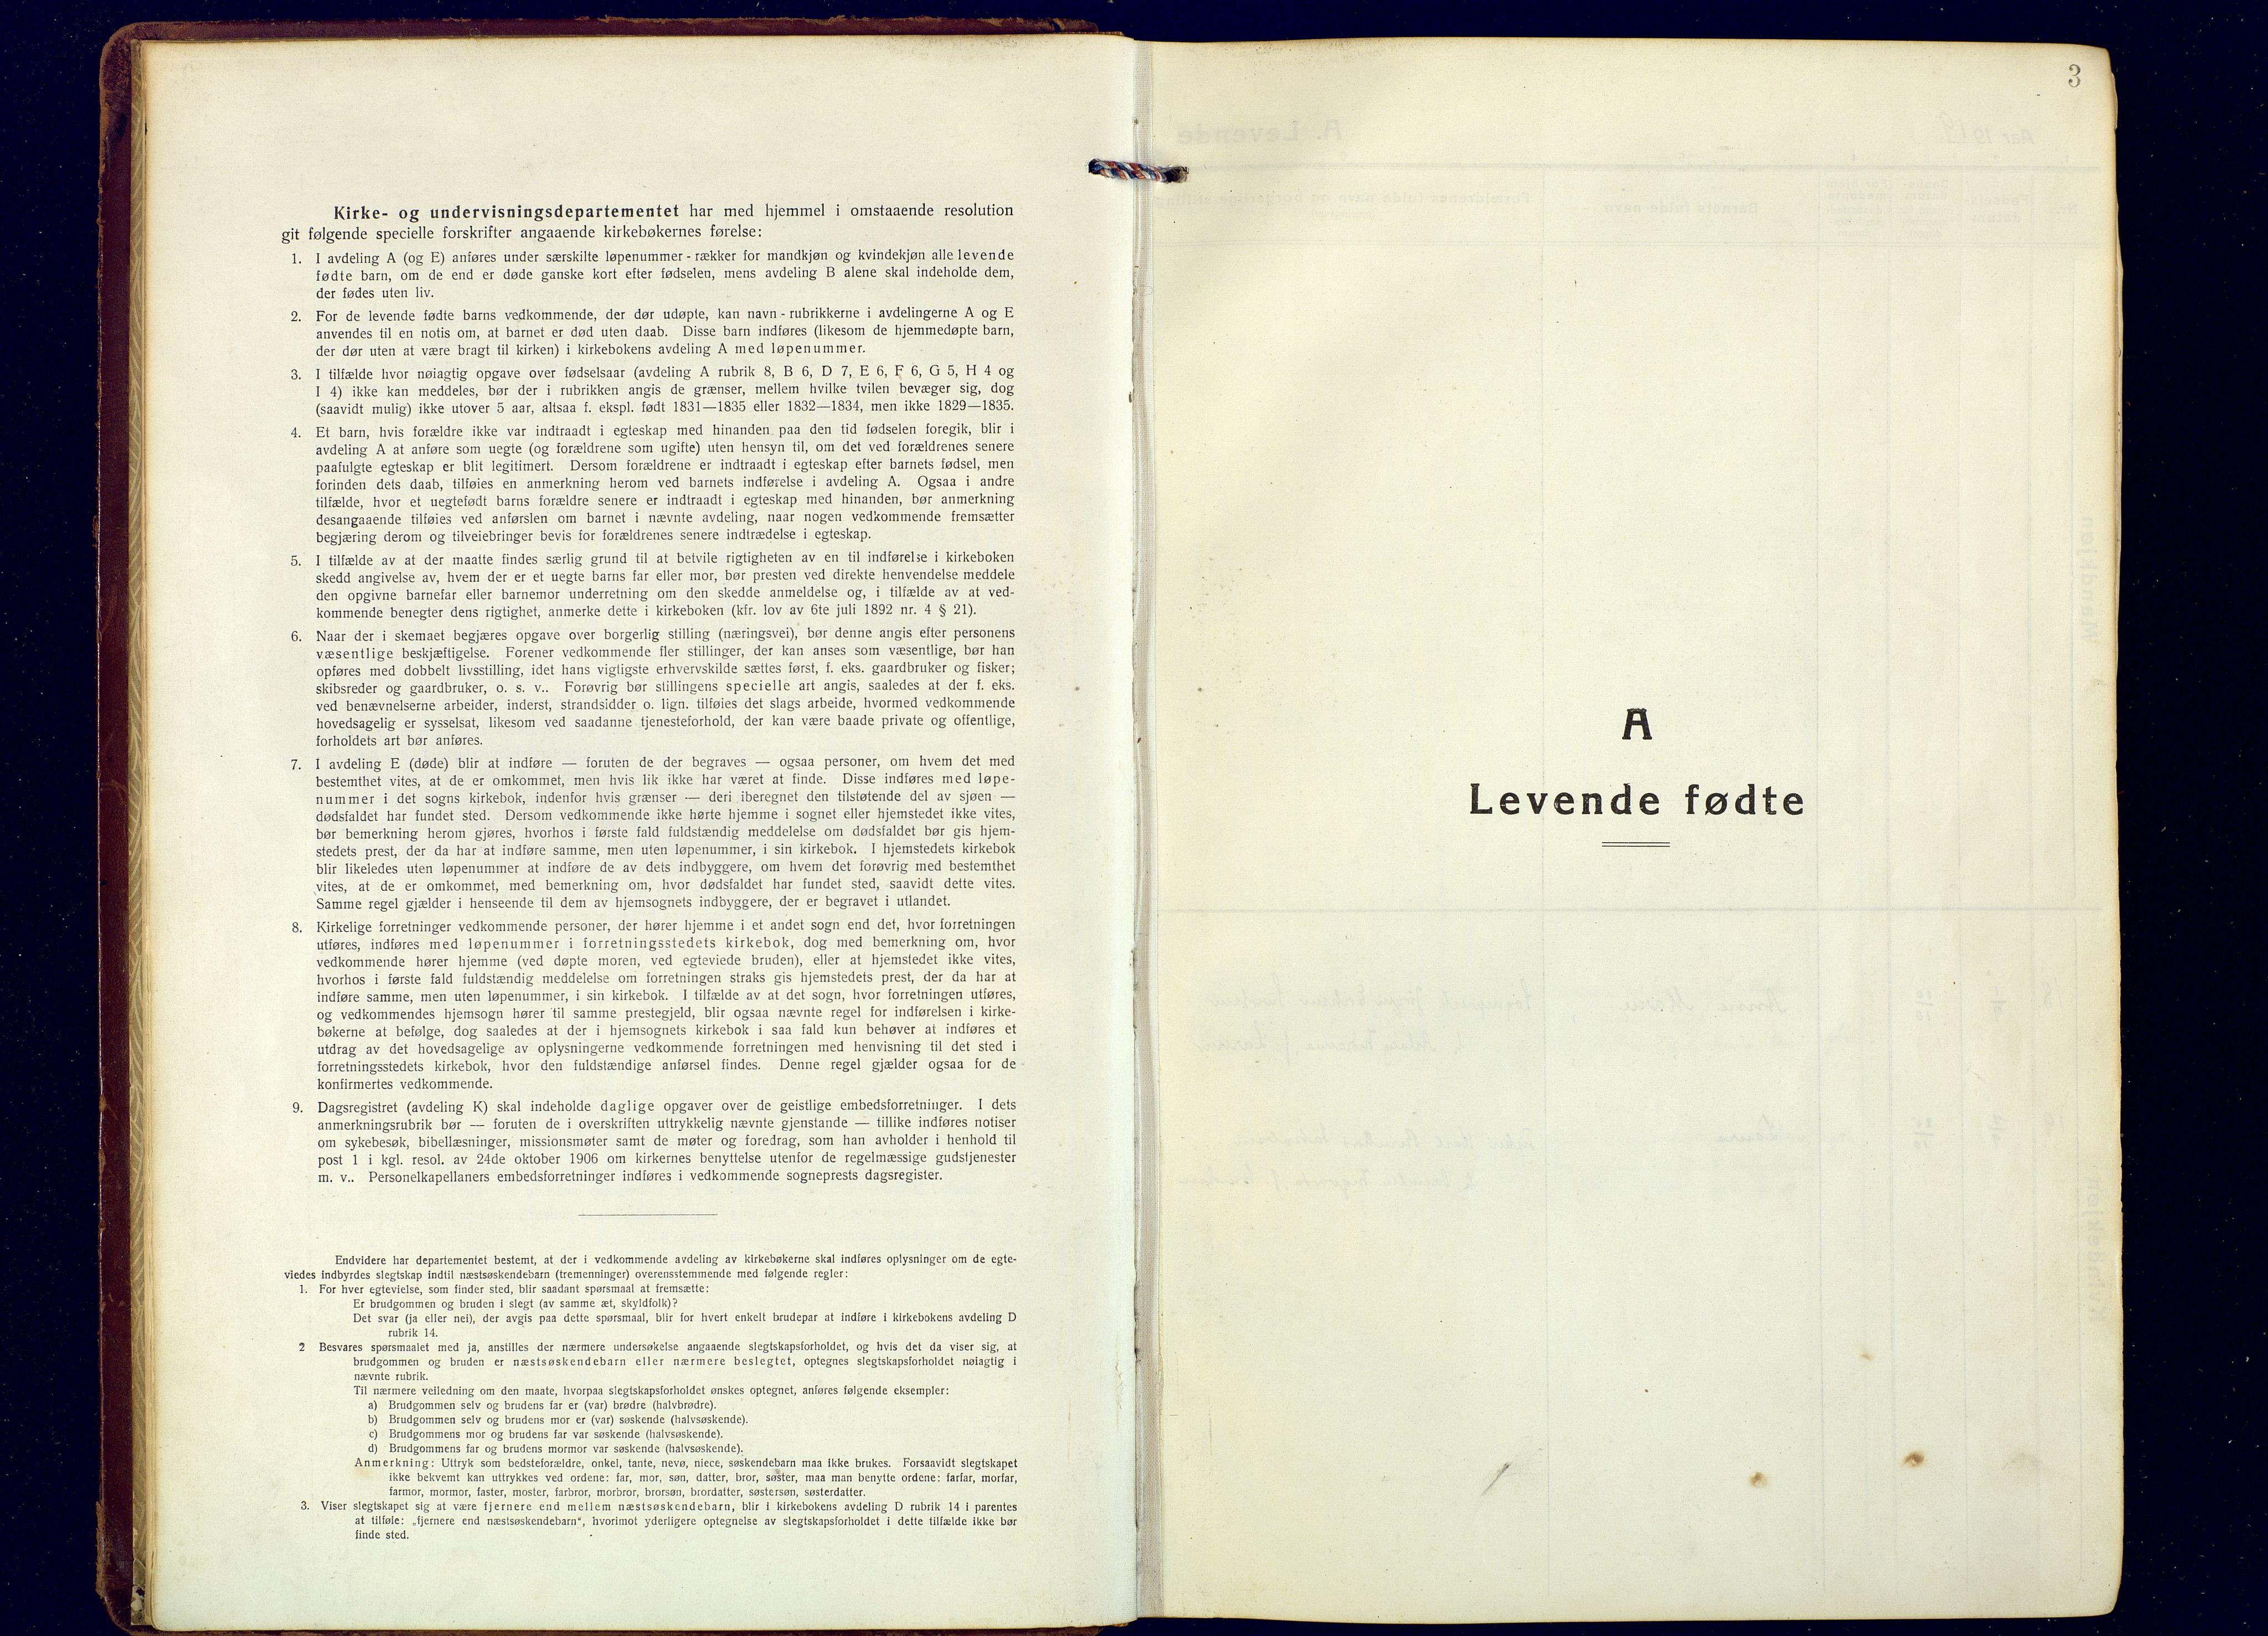 SATØ, Tranøy sokneprestkontor, I/Ia/Iaa: Ministerialbok nr. 16, 1919-1932, s. 3